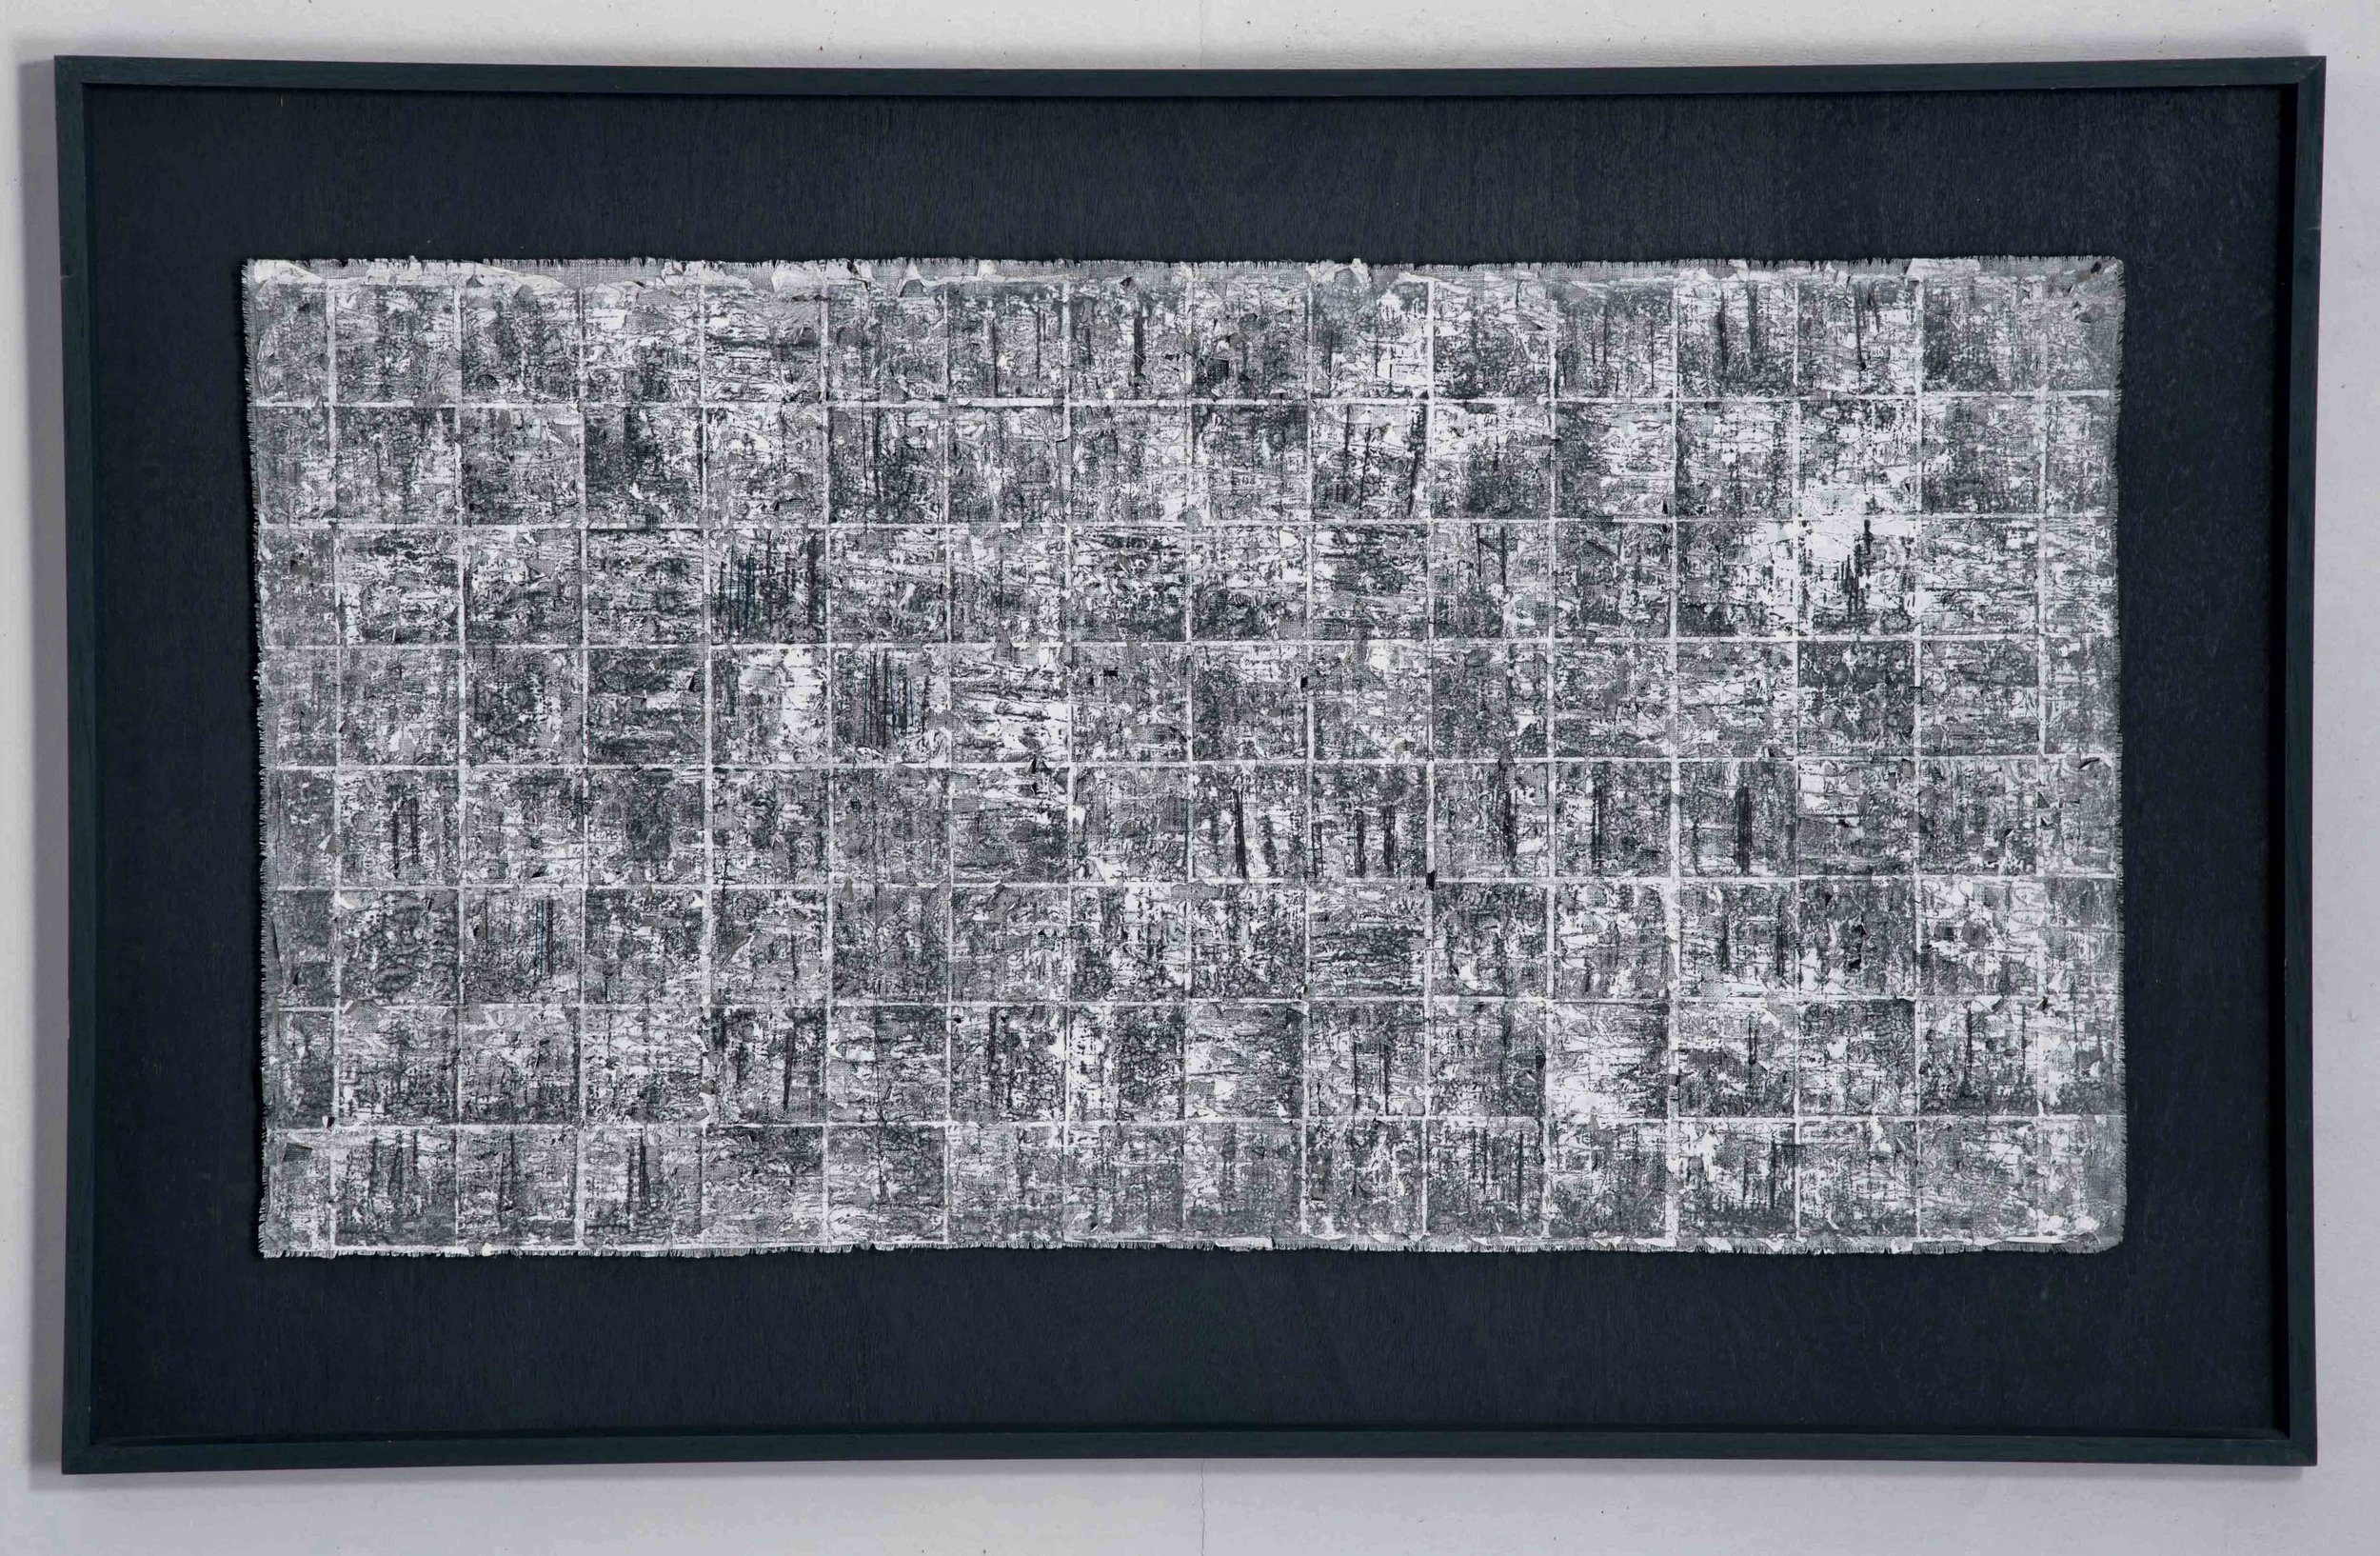 'Barren Arctic'. Framed size 95cm x 50cm